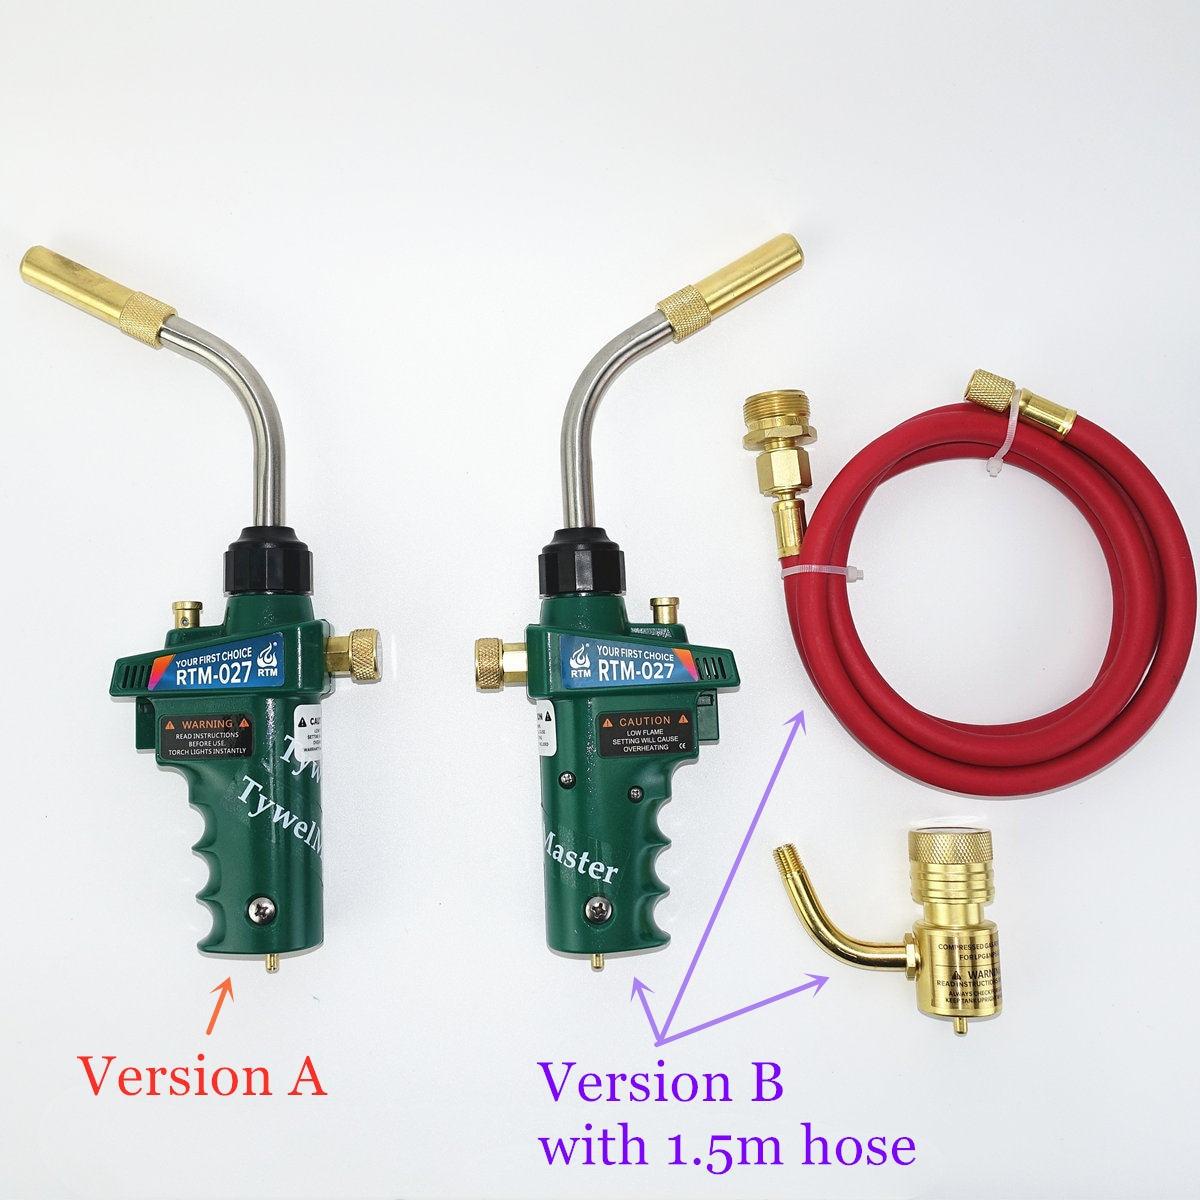 Professional Mapp Torch Piezo Ignition Gas Flame Brazing Tool 1.5m Hose CGA600 BBQ Heating Quenching HVAC Plumbing Welding Torch